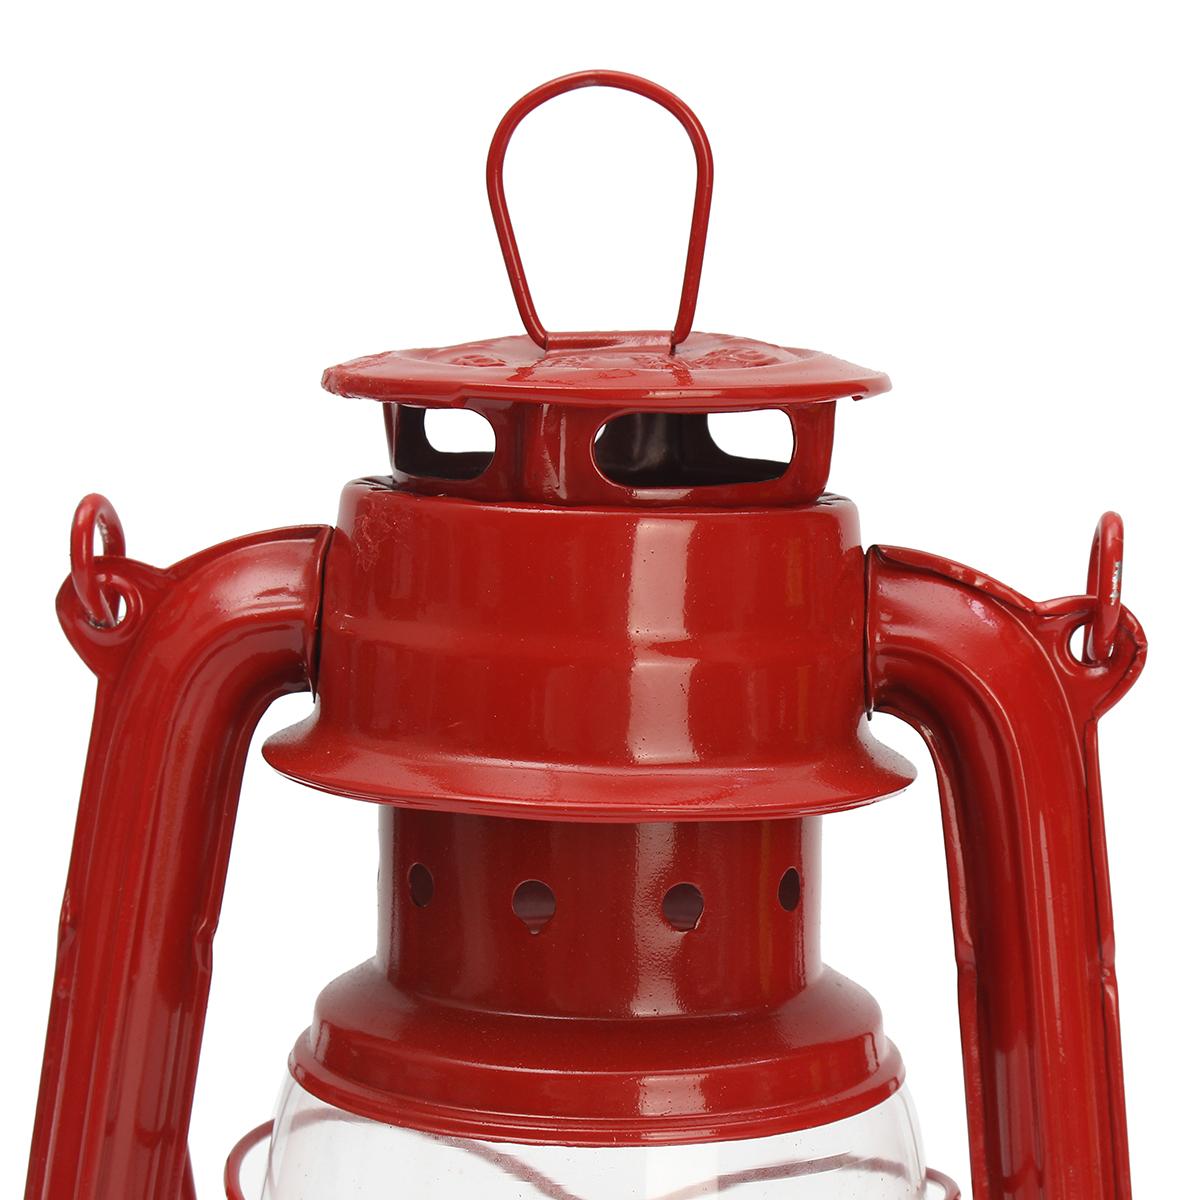 Vintage Oil Lamp Lantern Kerosene Paraffin Hurricane Lamp Light Outdoor Camping